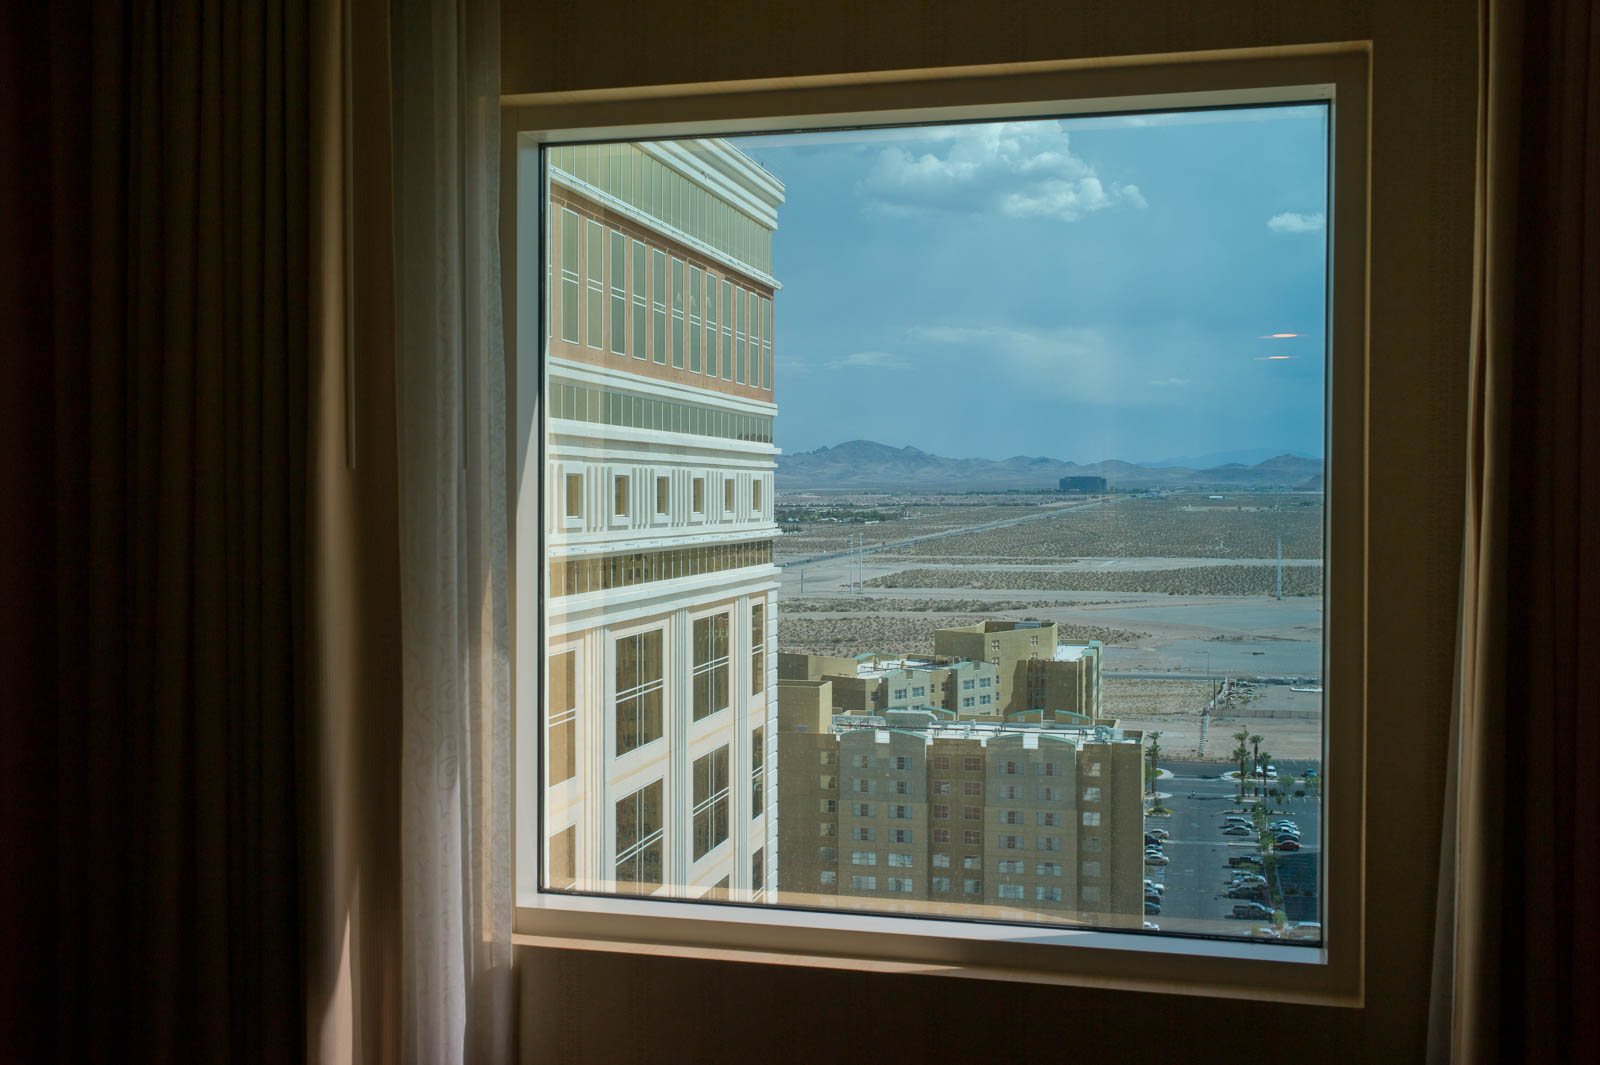 Unknown, Mandalay Bay Hotel & Casino, Las Vegas